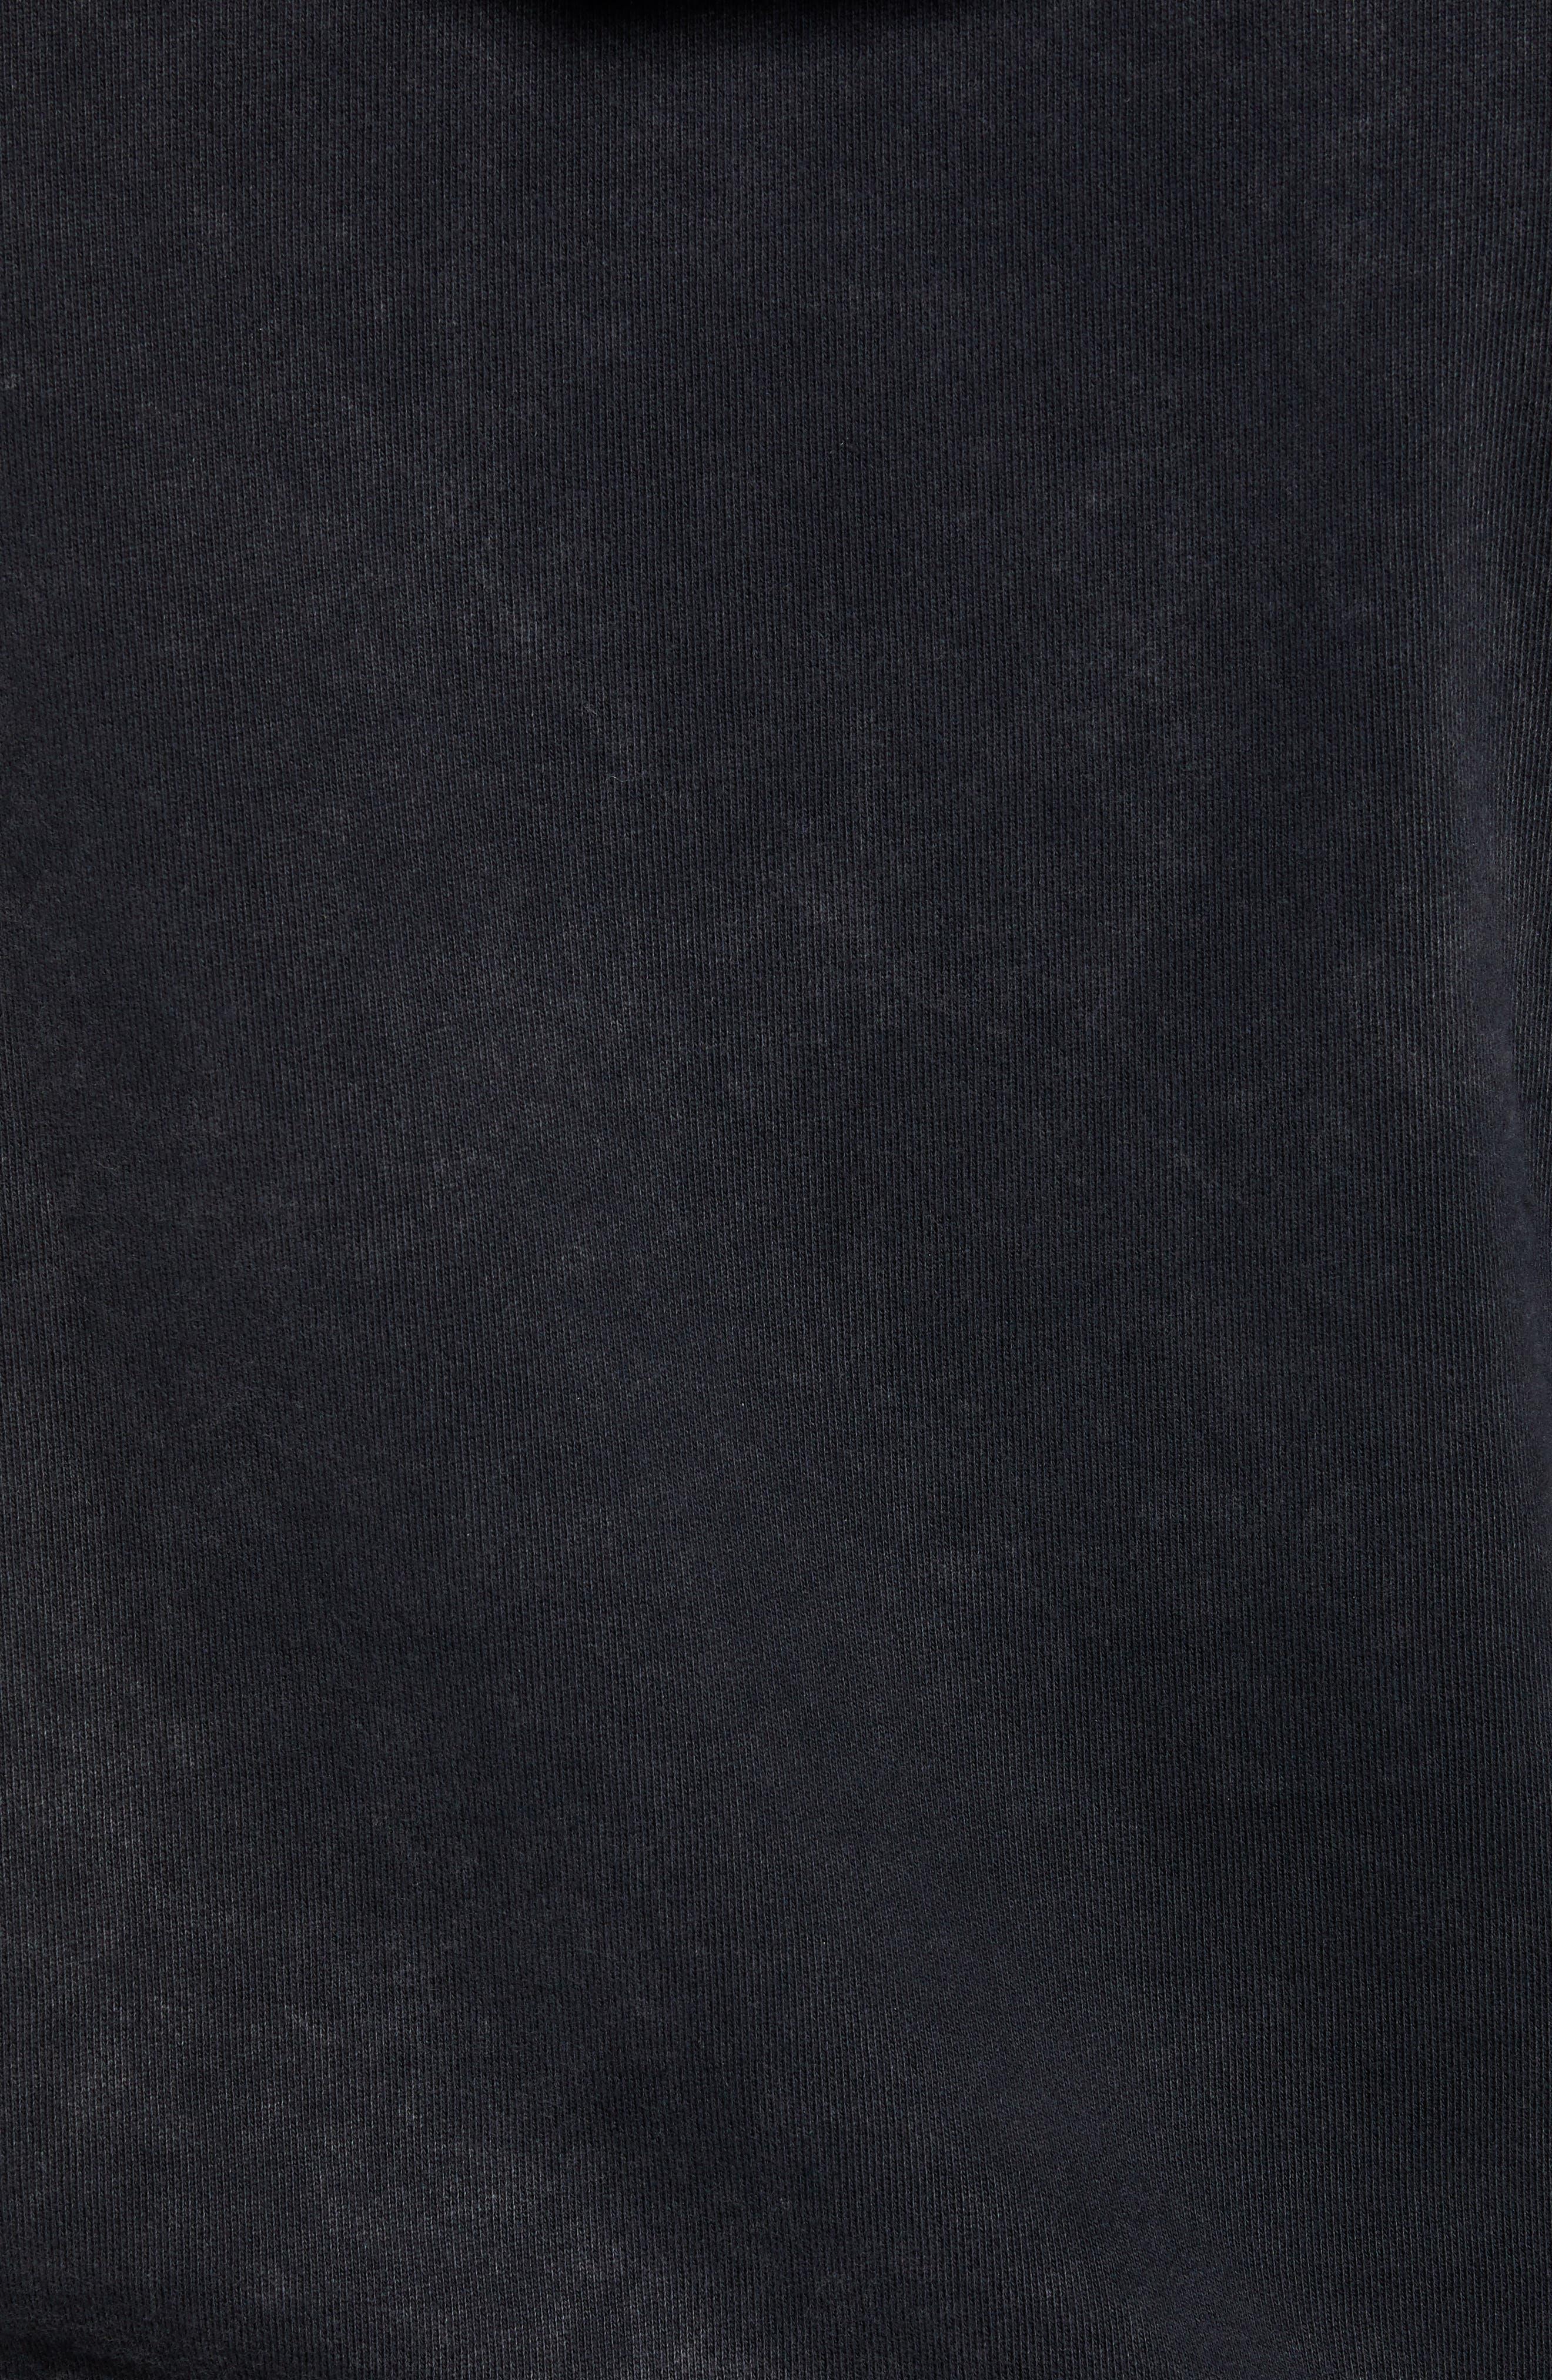 Vampire Graphic Hooded Sweatshirt,                             Alternate thumbnail 5, color,                             BLACK